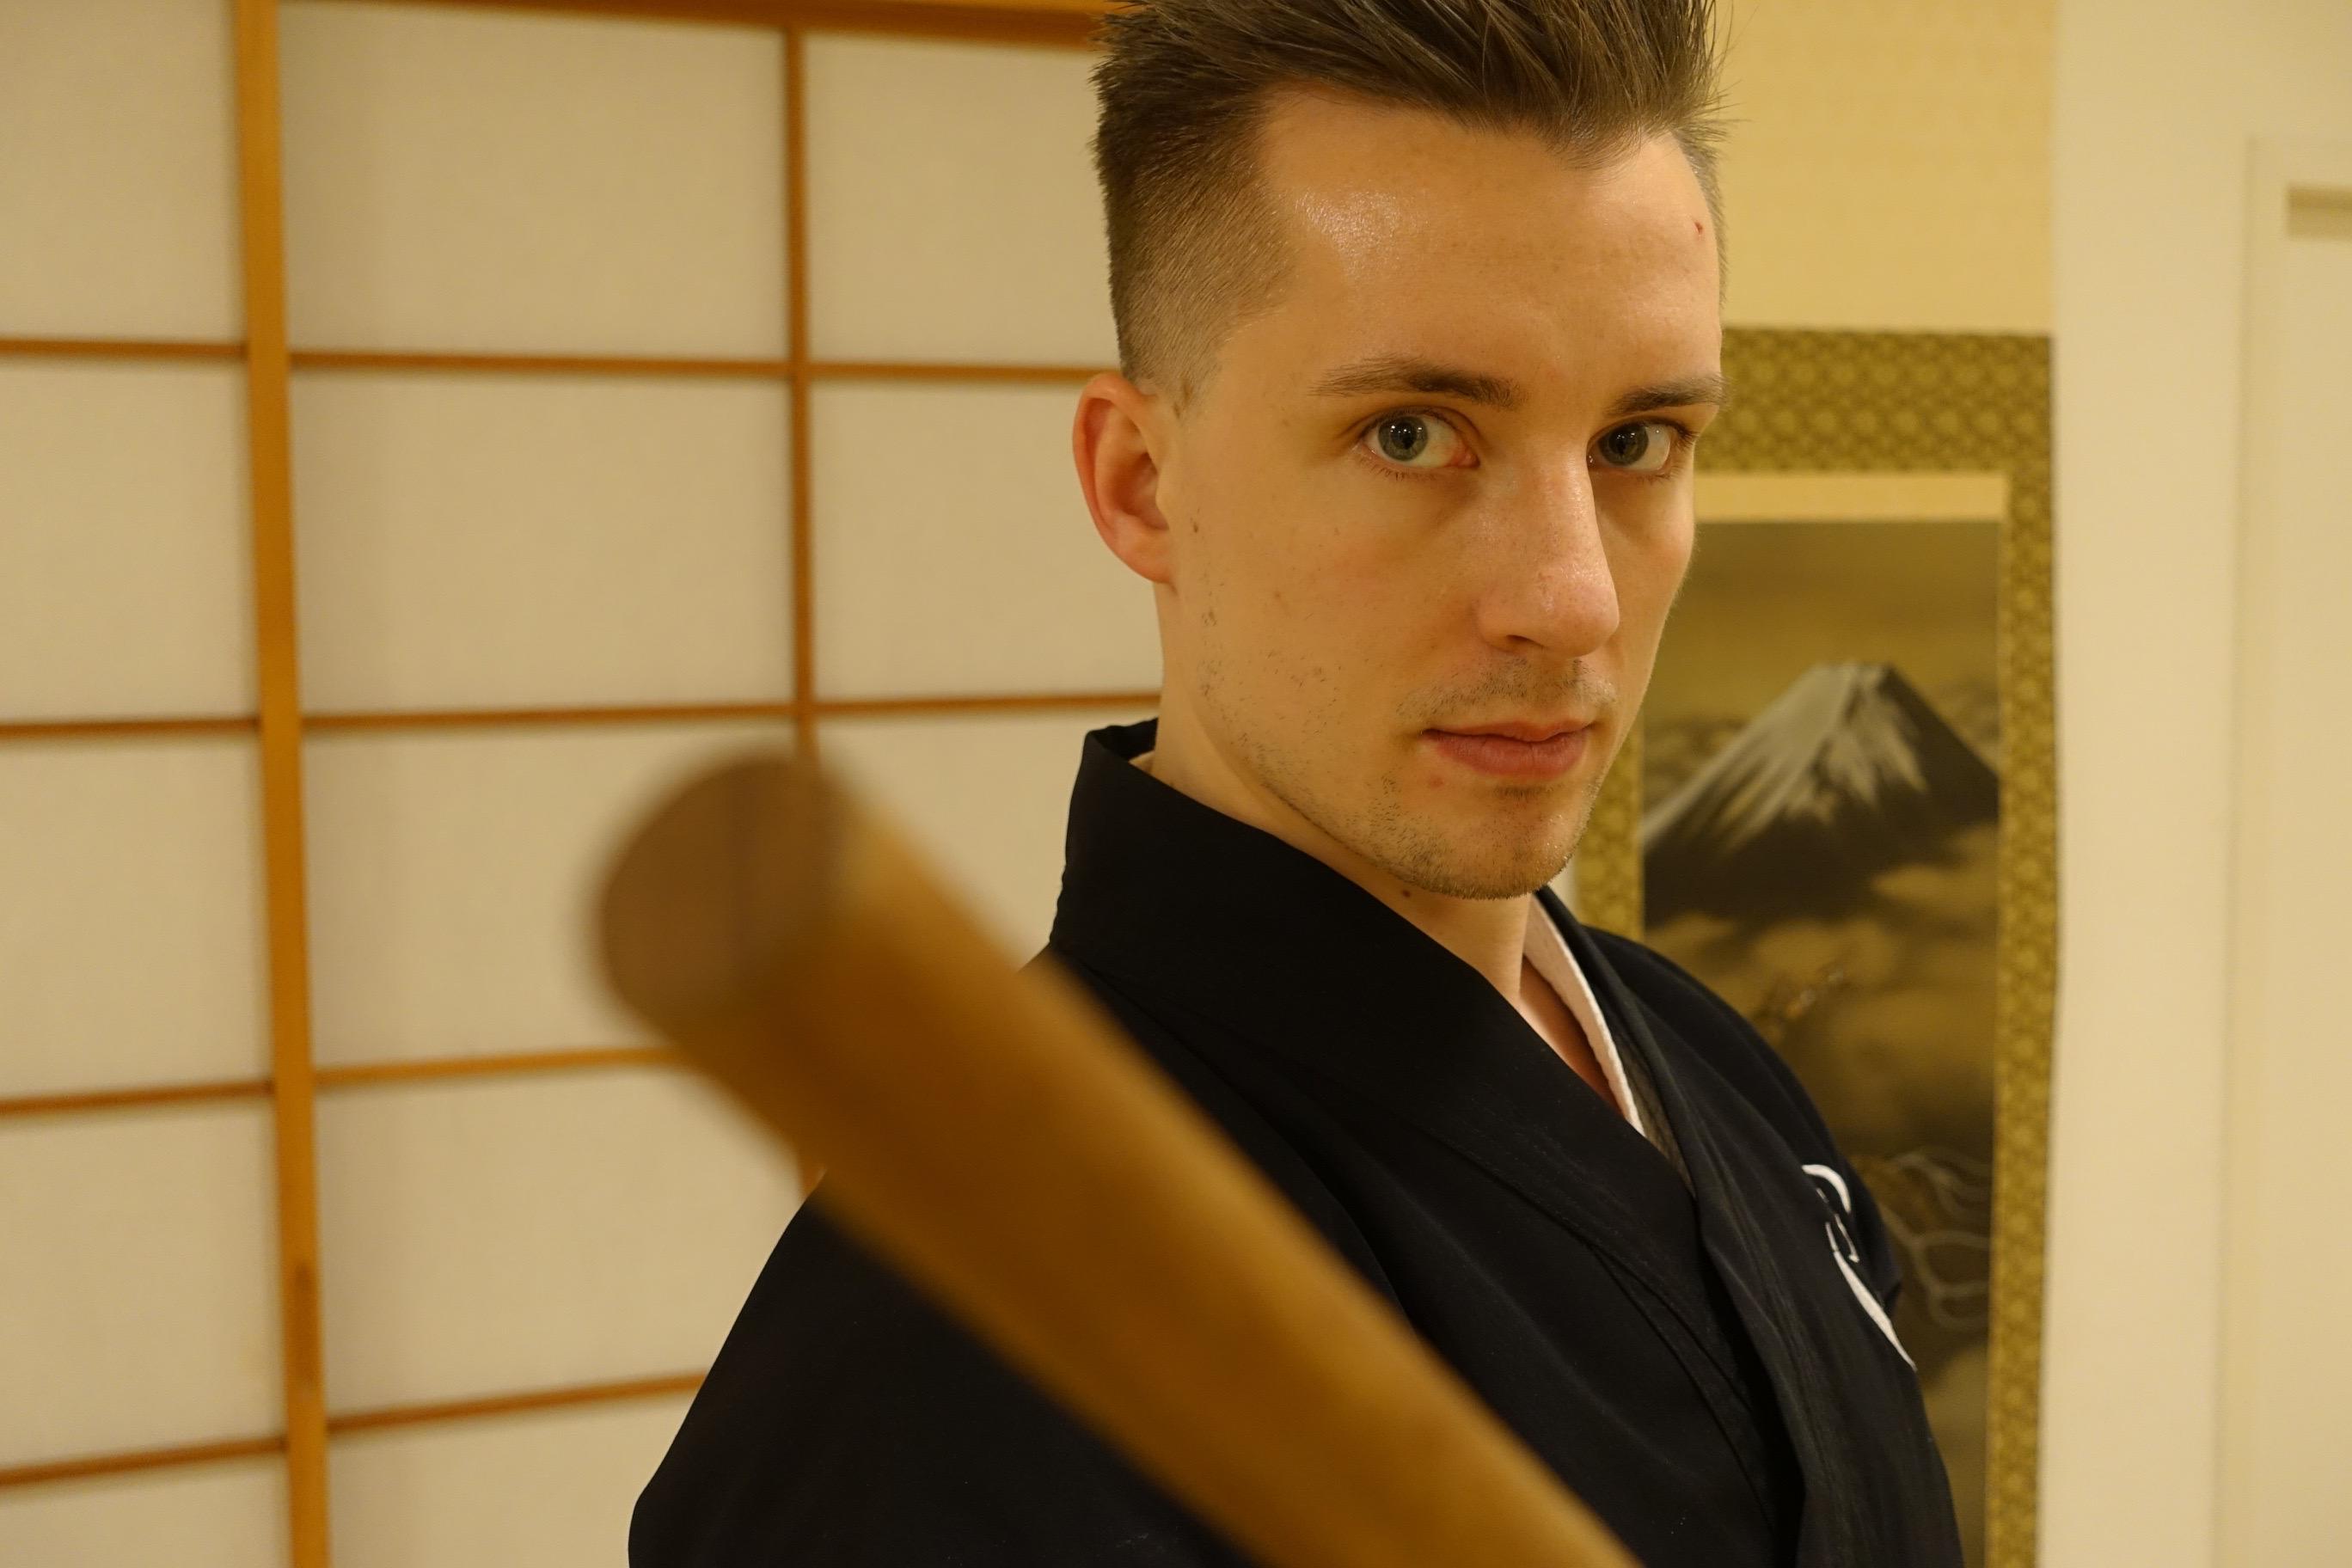 Tenshinkai Dojo Hamburg - Schule für japanische Kampfkunst